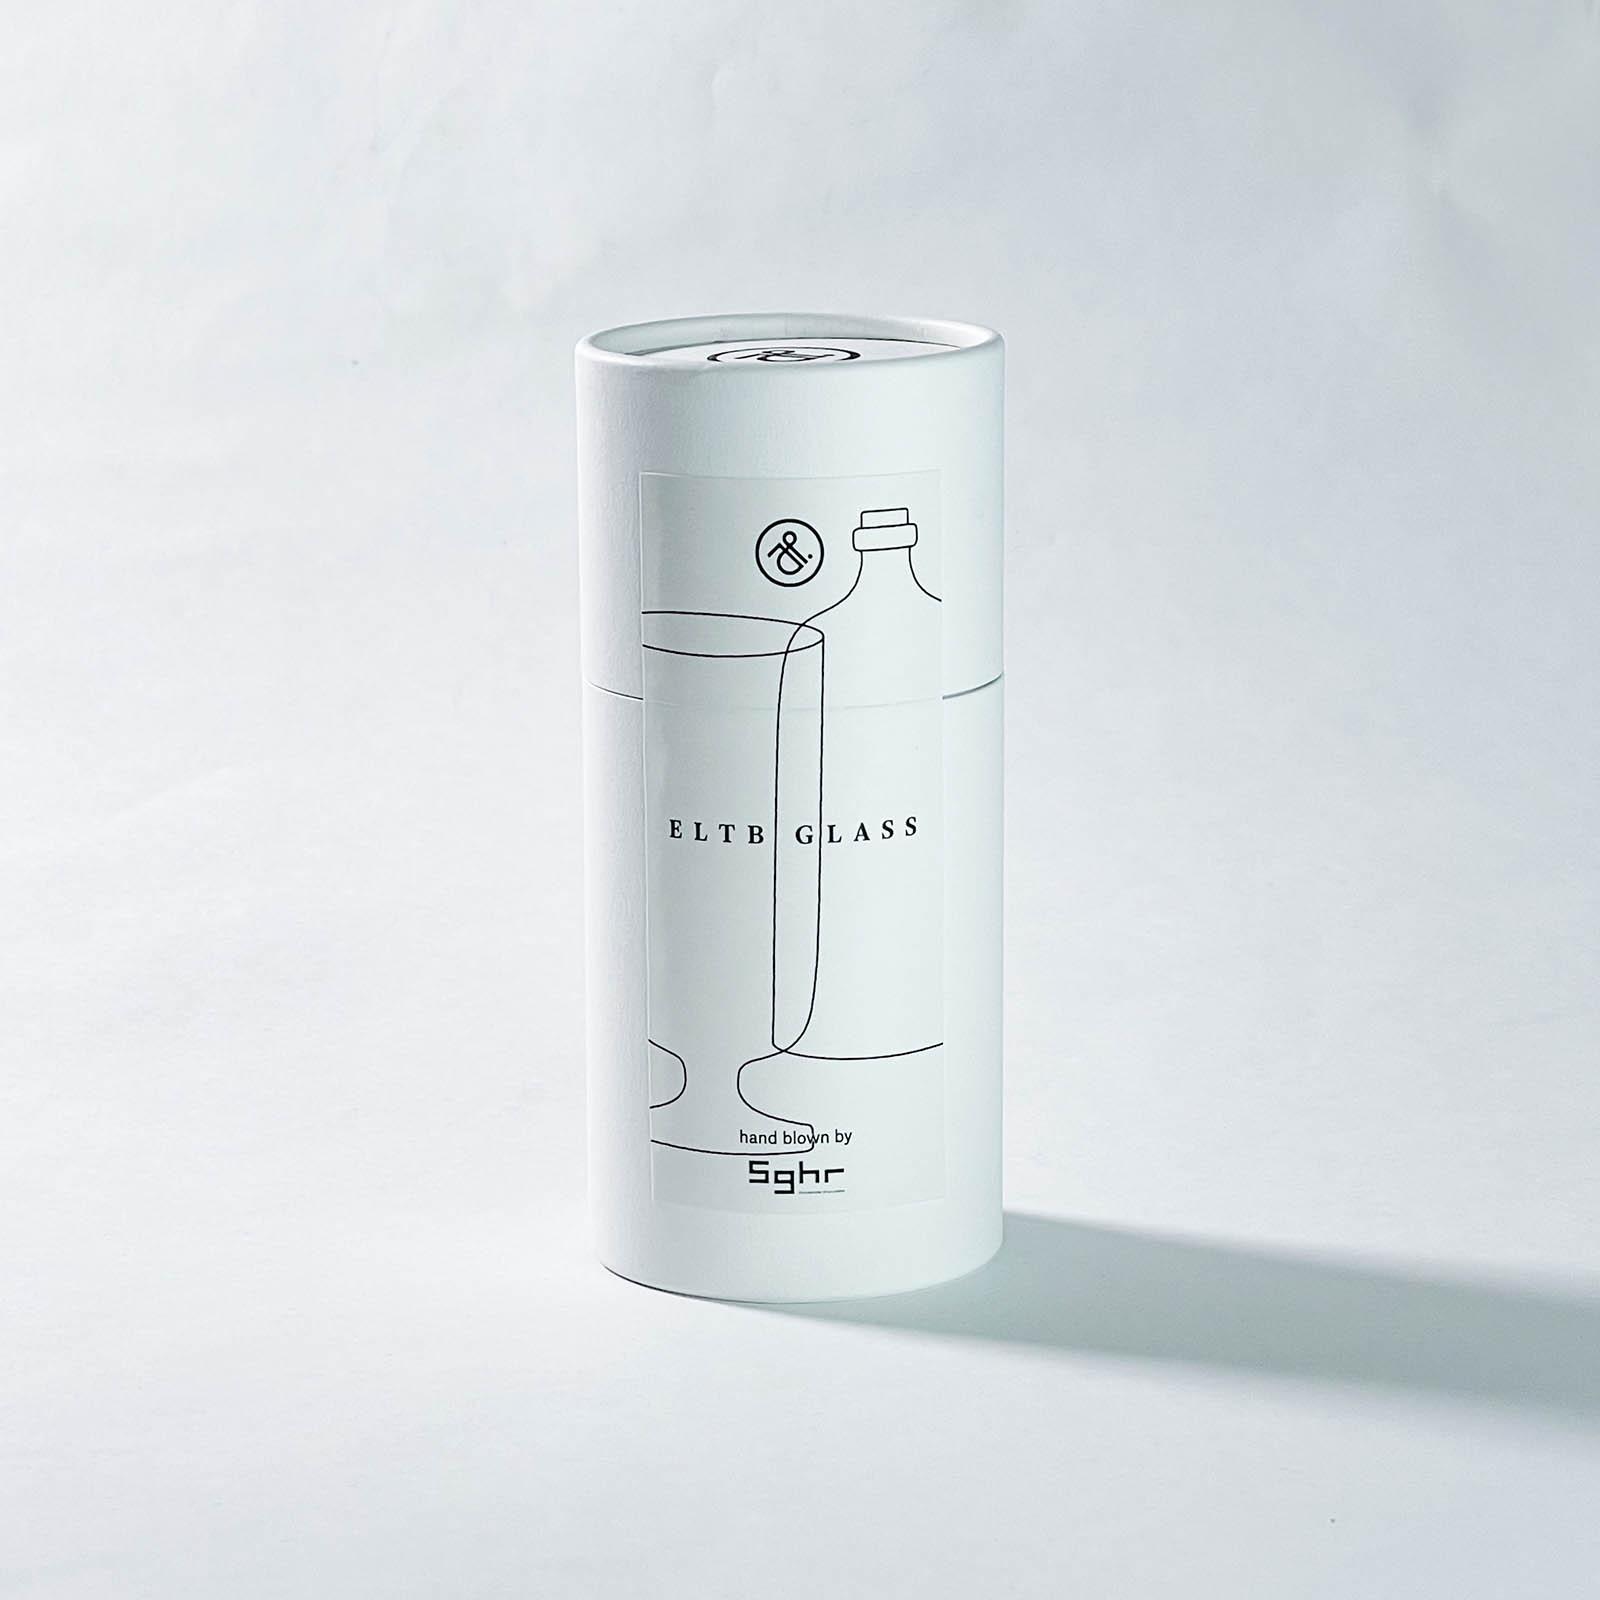 mitosaya × Sghr:蒸留酒 RAKKASEI PEANUT 1本+ELTB GLASS 1客 セット GIFT